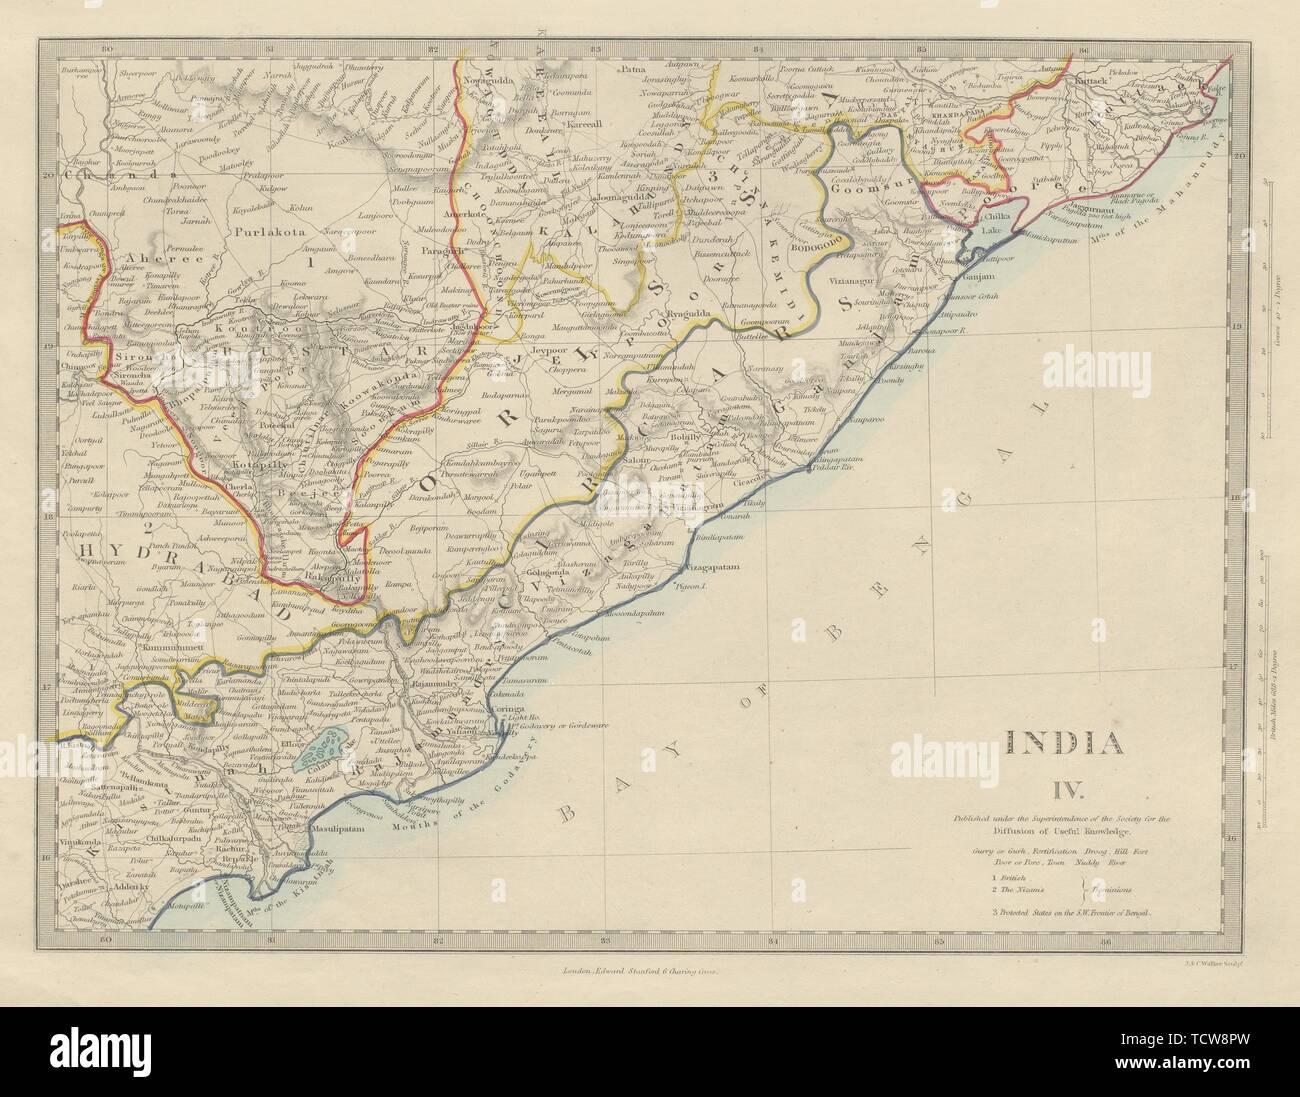 L'INDE Circars Hyderabad Andhra Pradesh d'Odisha Orissa Chhattisgarh. Carte 1874 SDUK Photo Stock